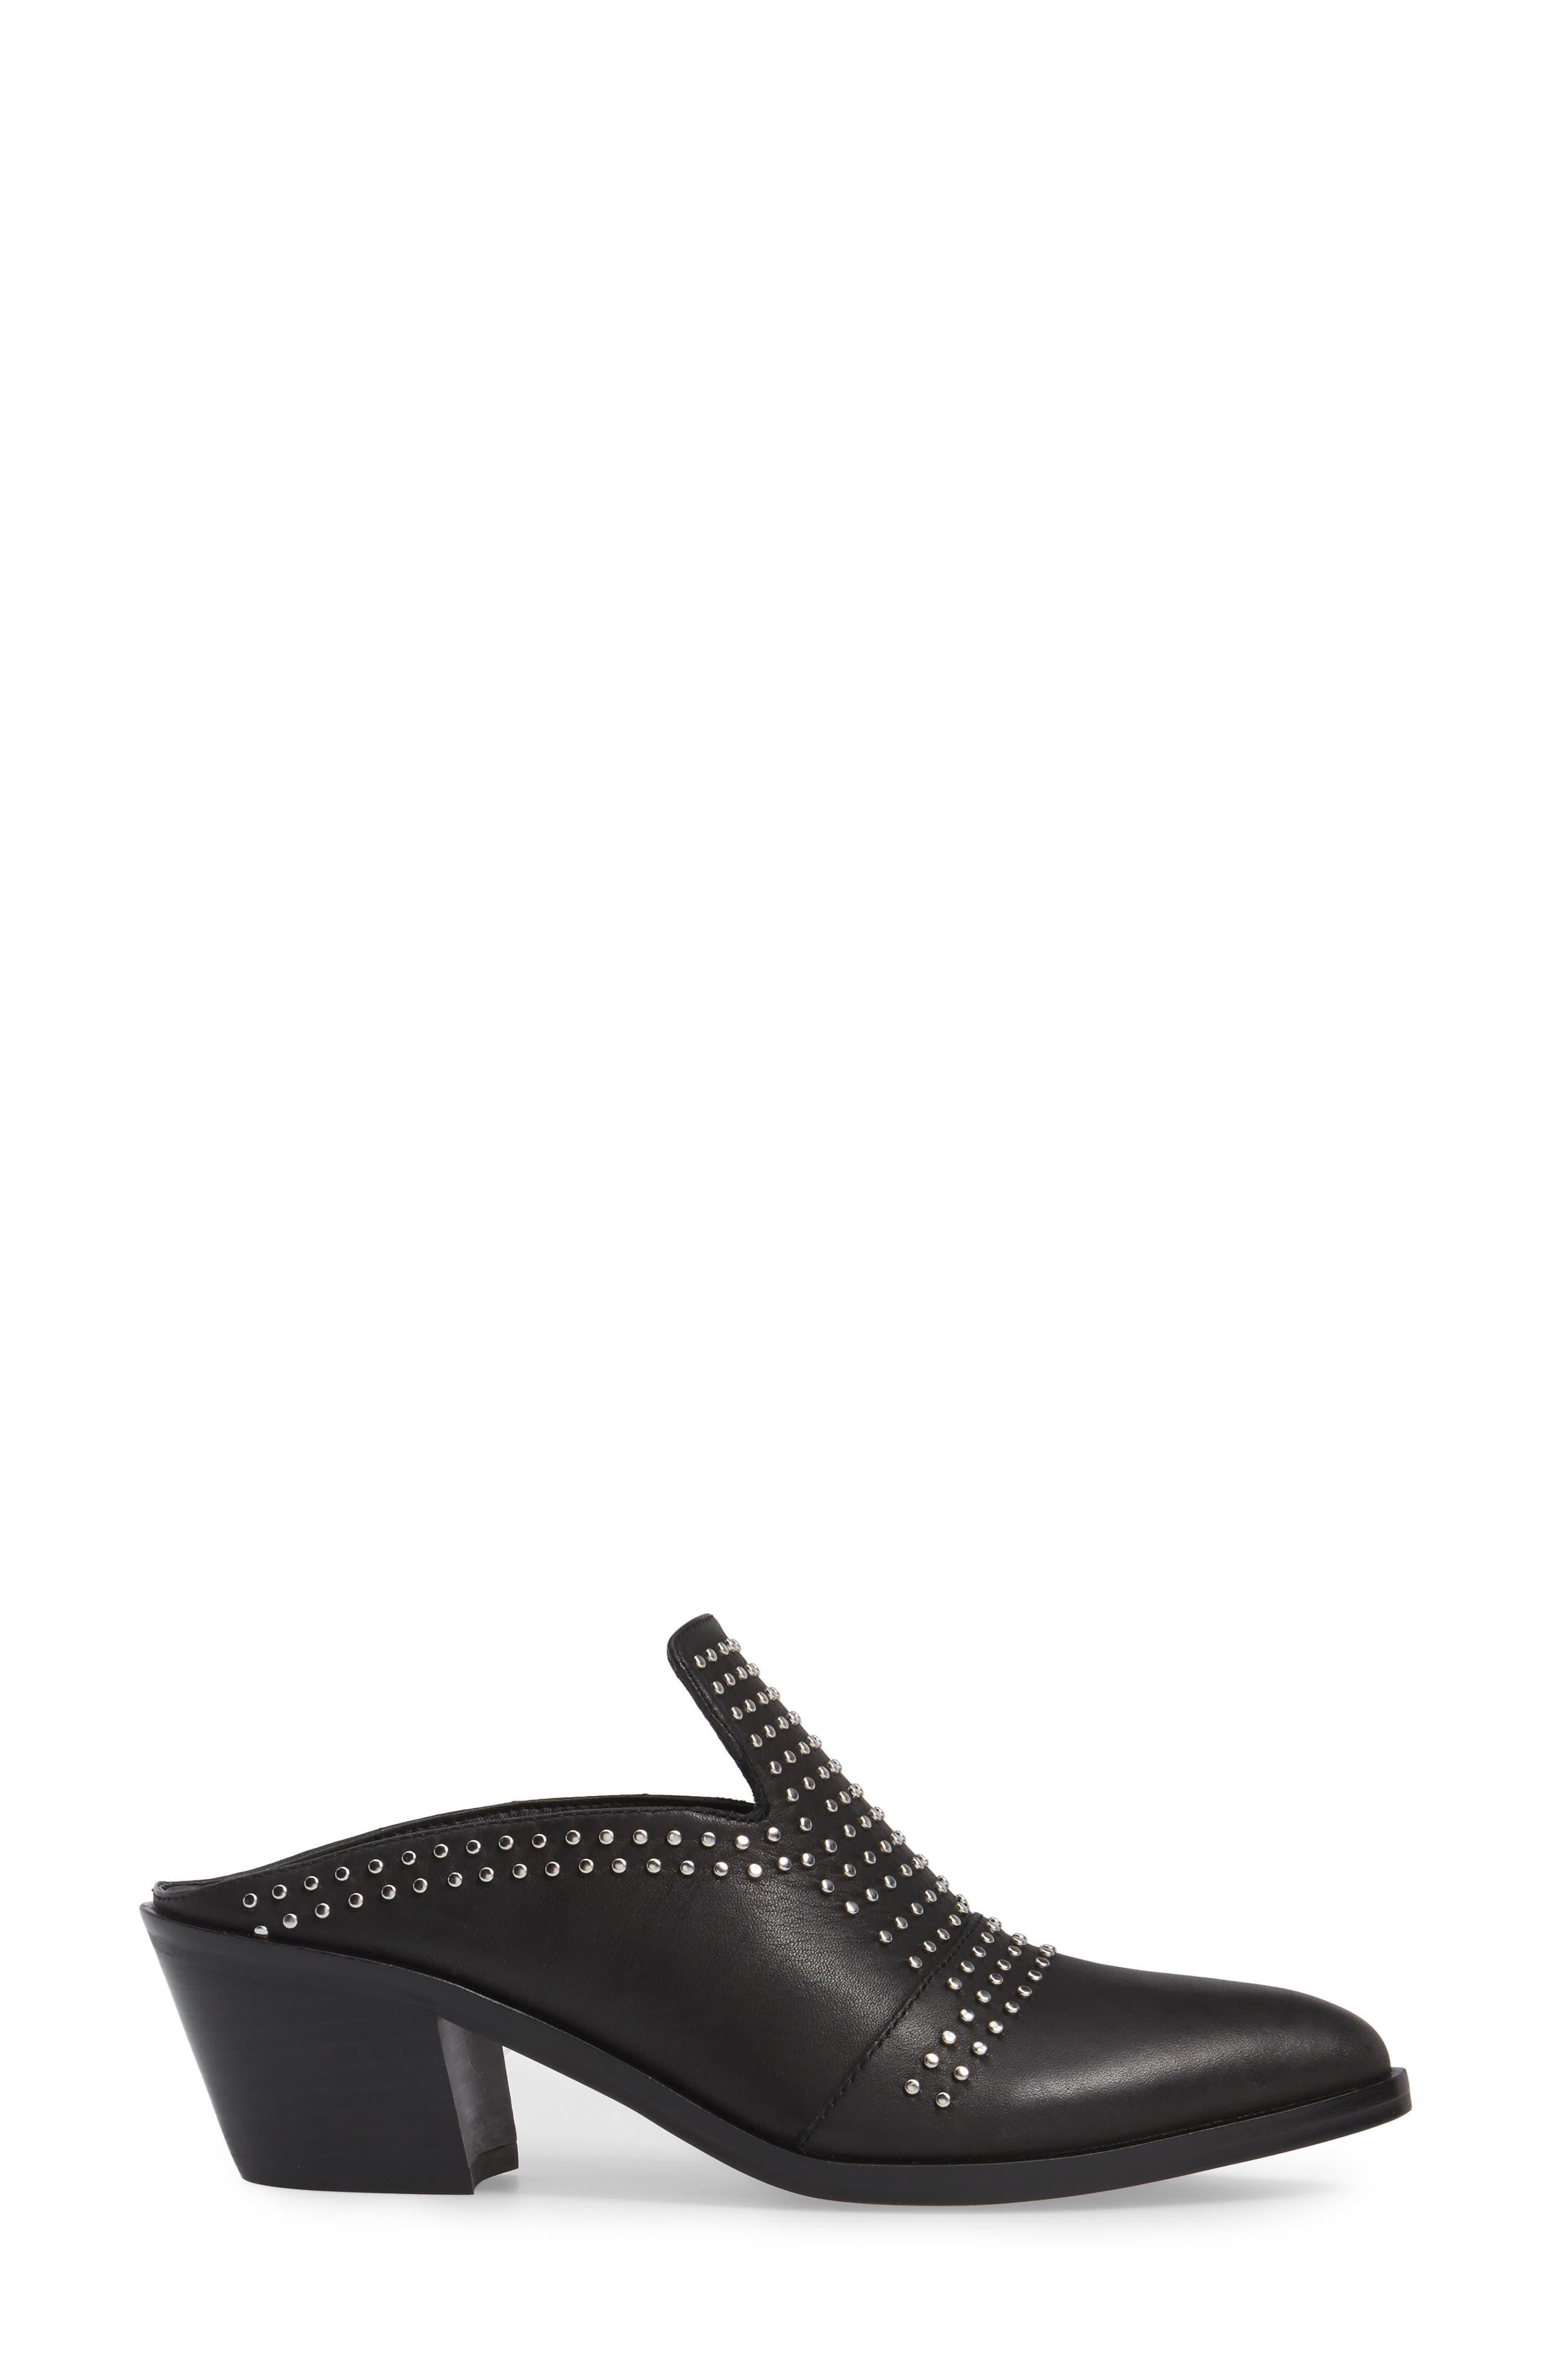 Lon Studded Loafer Mule,                             Alternate thumbnail 3, color,                             Black Leather